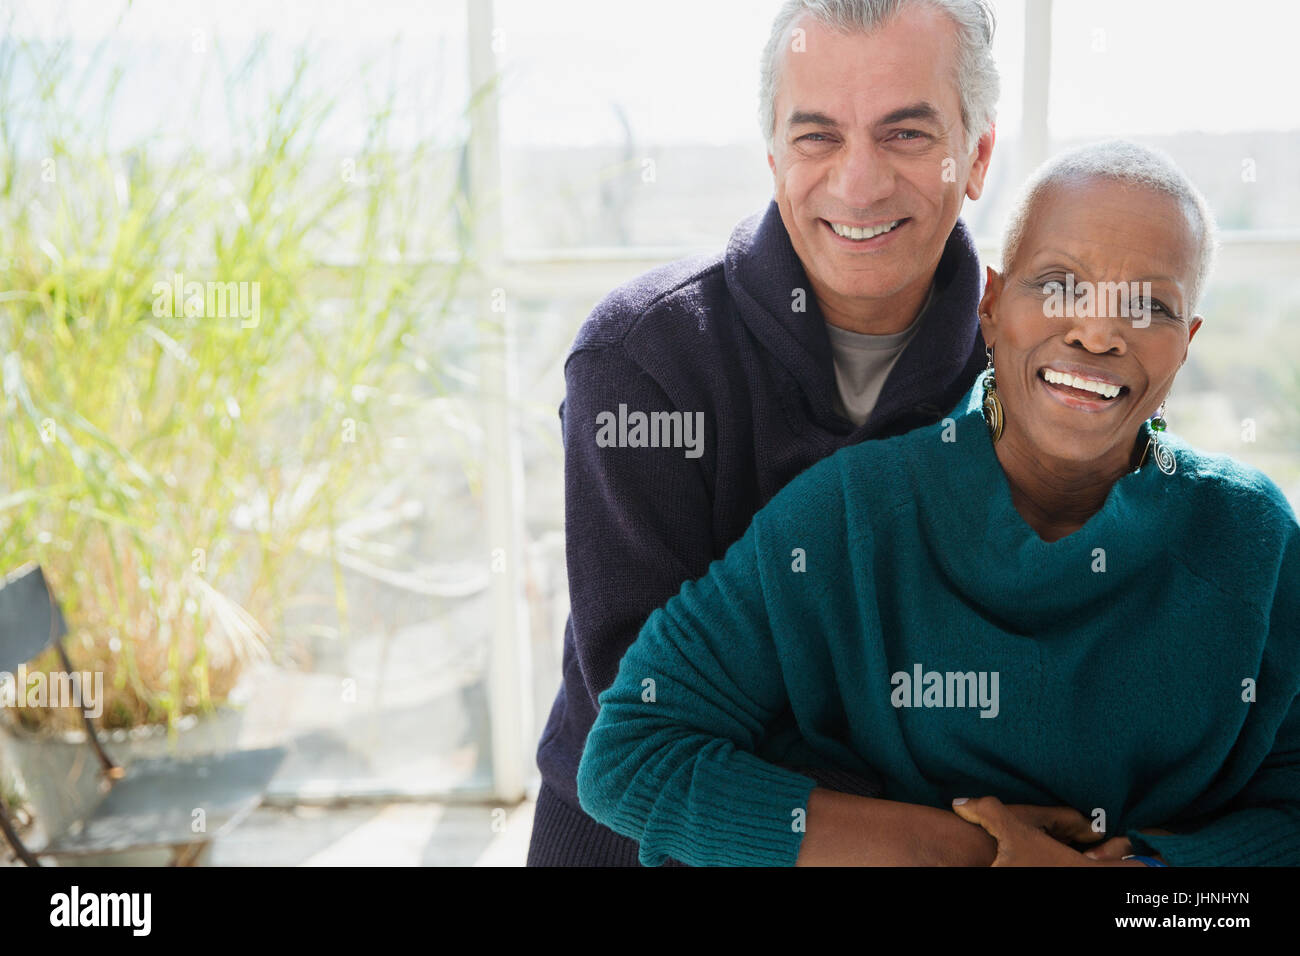 Portrait smiling senior couple hugging on sun porch - Stock Image